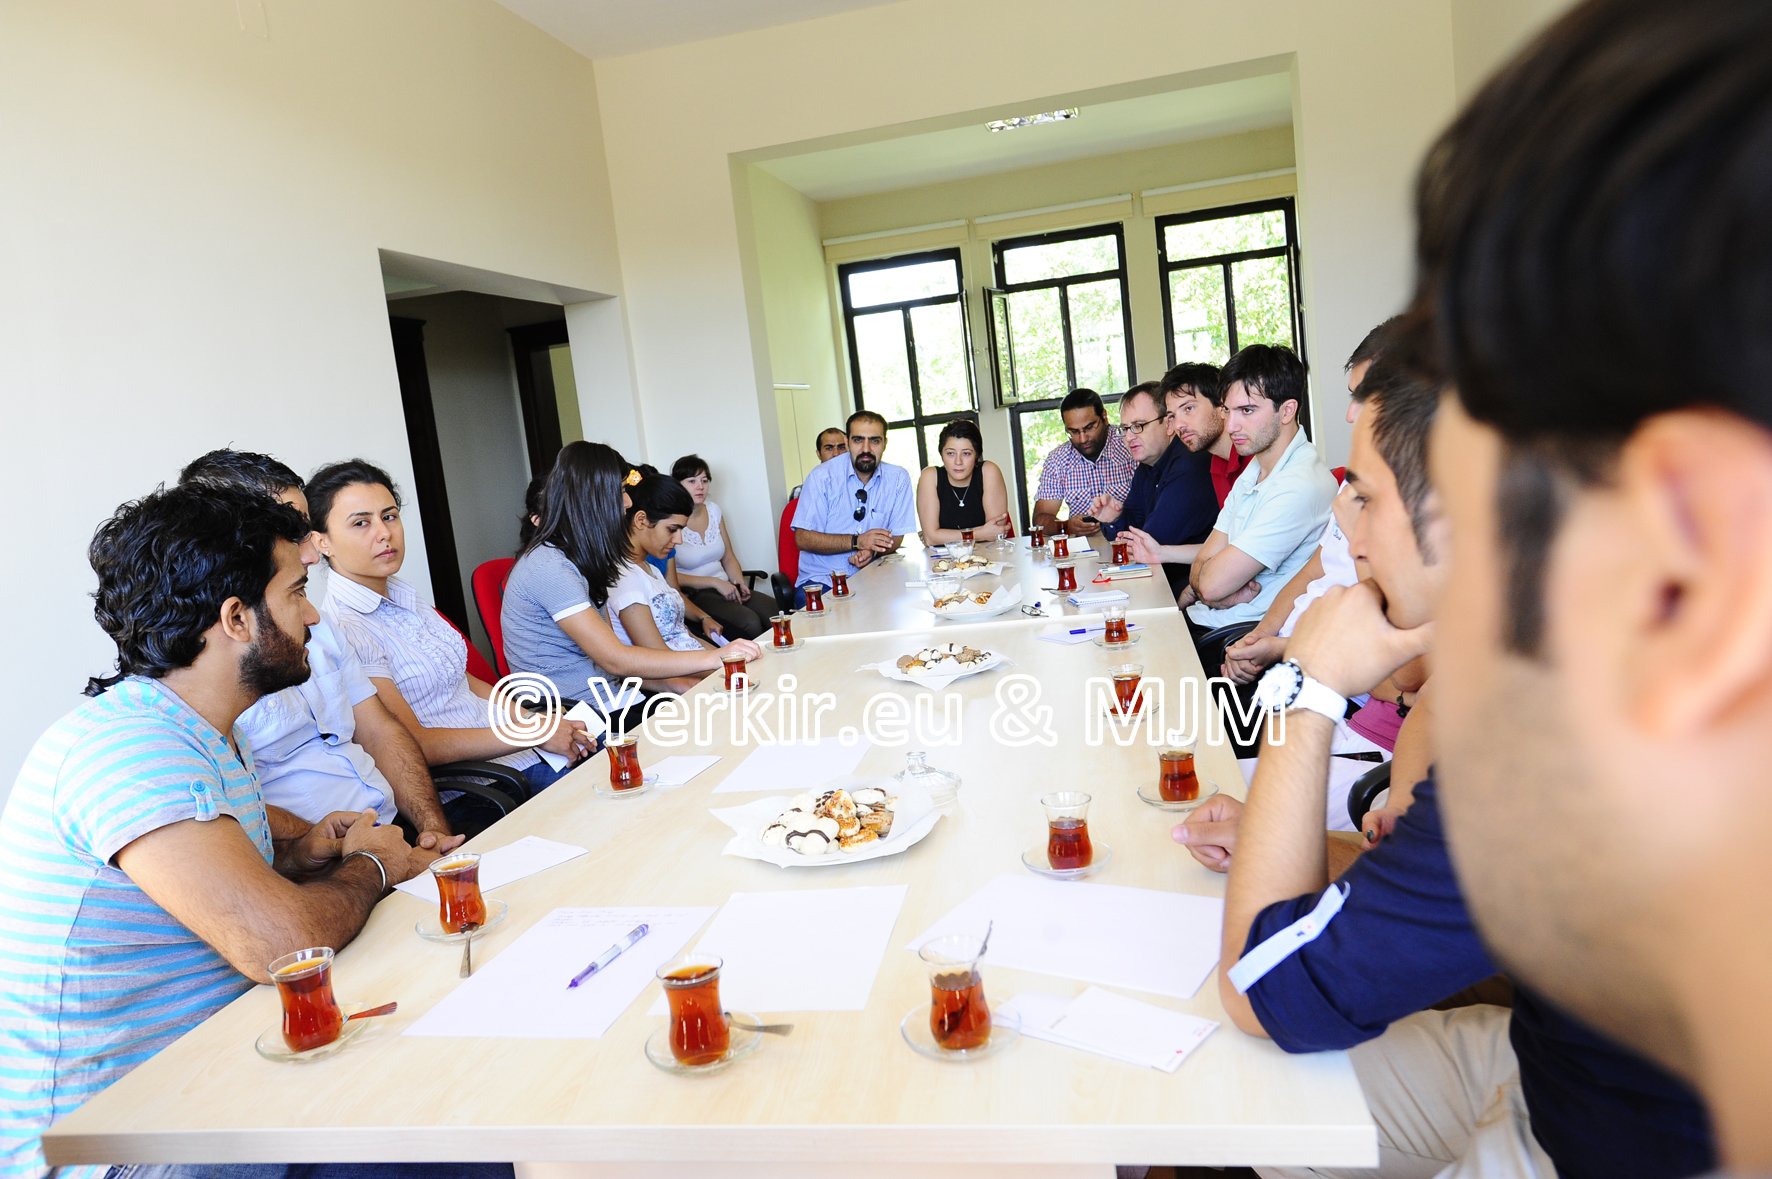 Rencontre avec l'Agenda 21, conseil des associations étudiantes de Diyarabkir